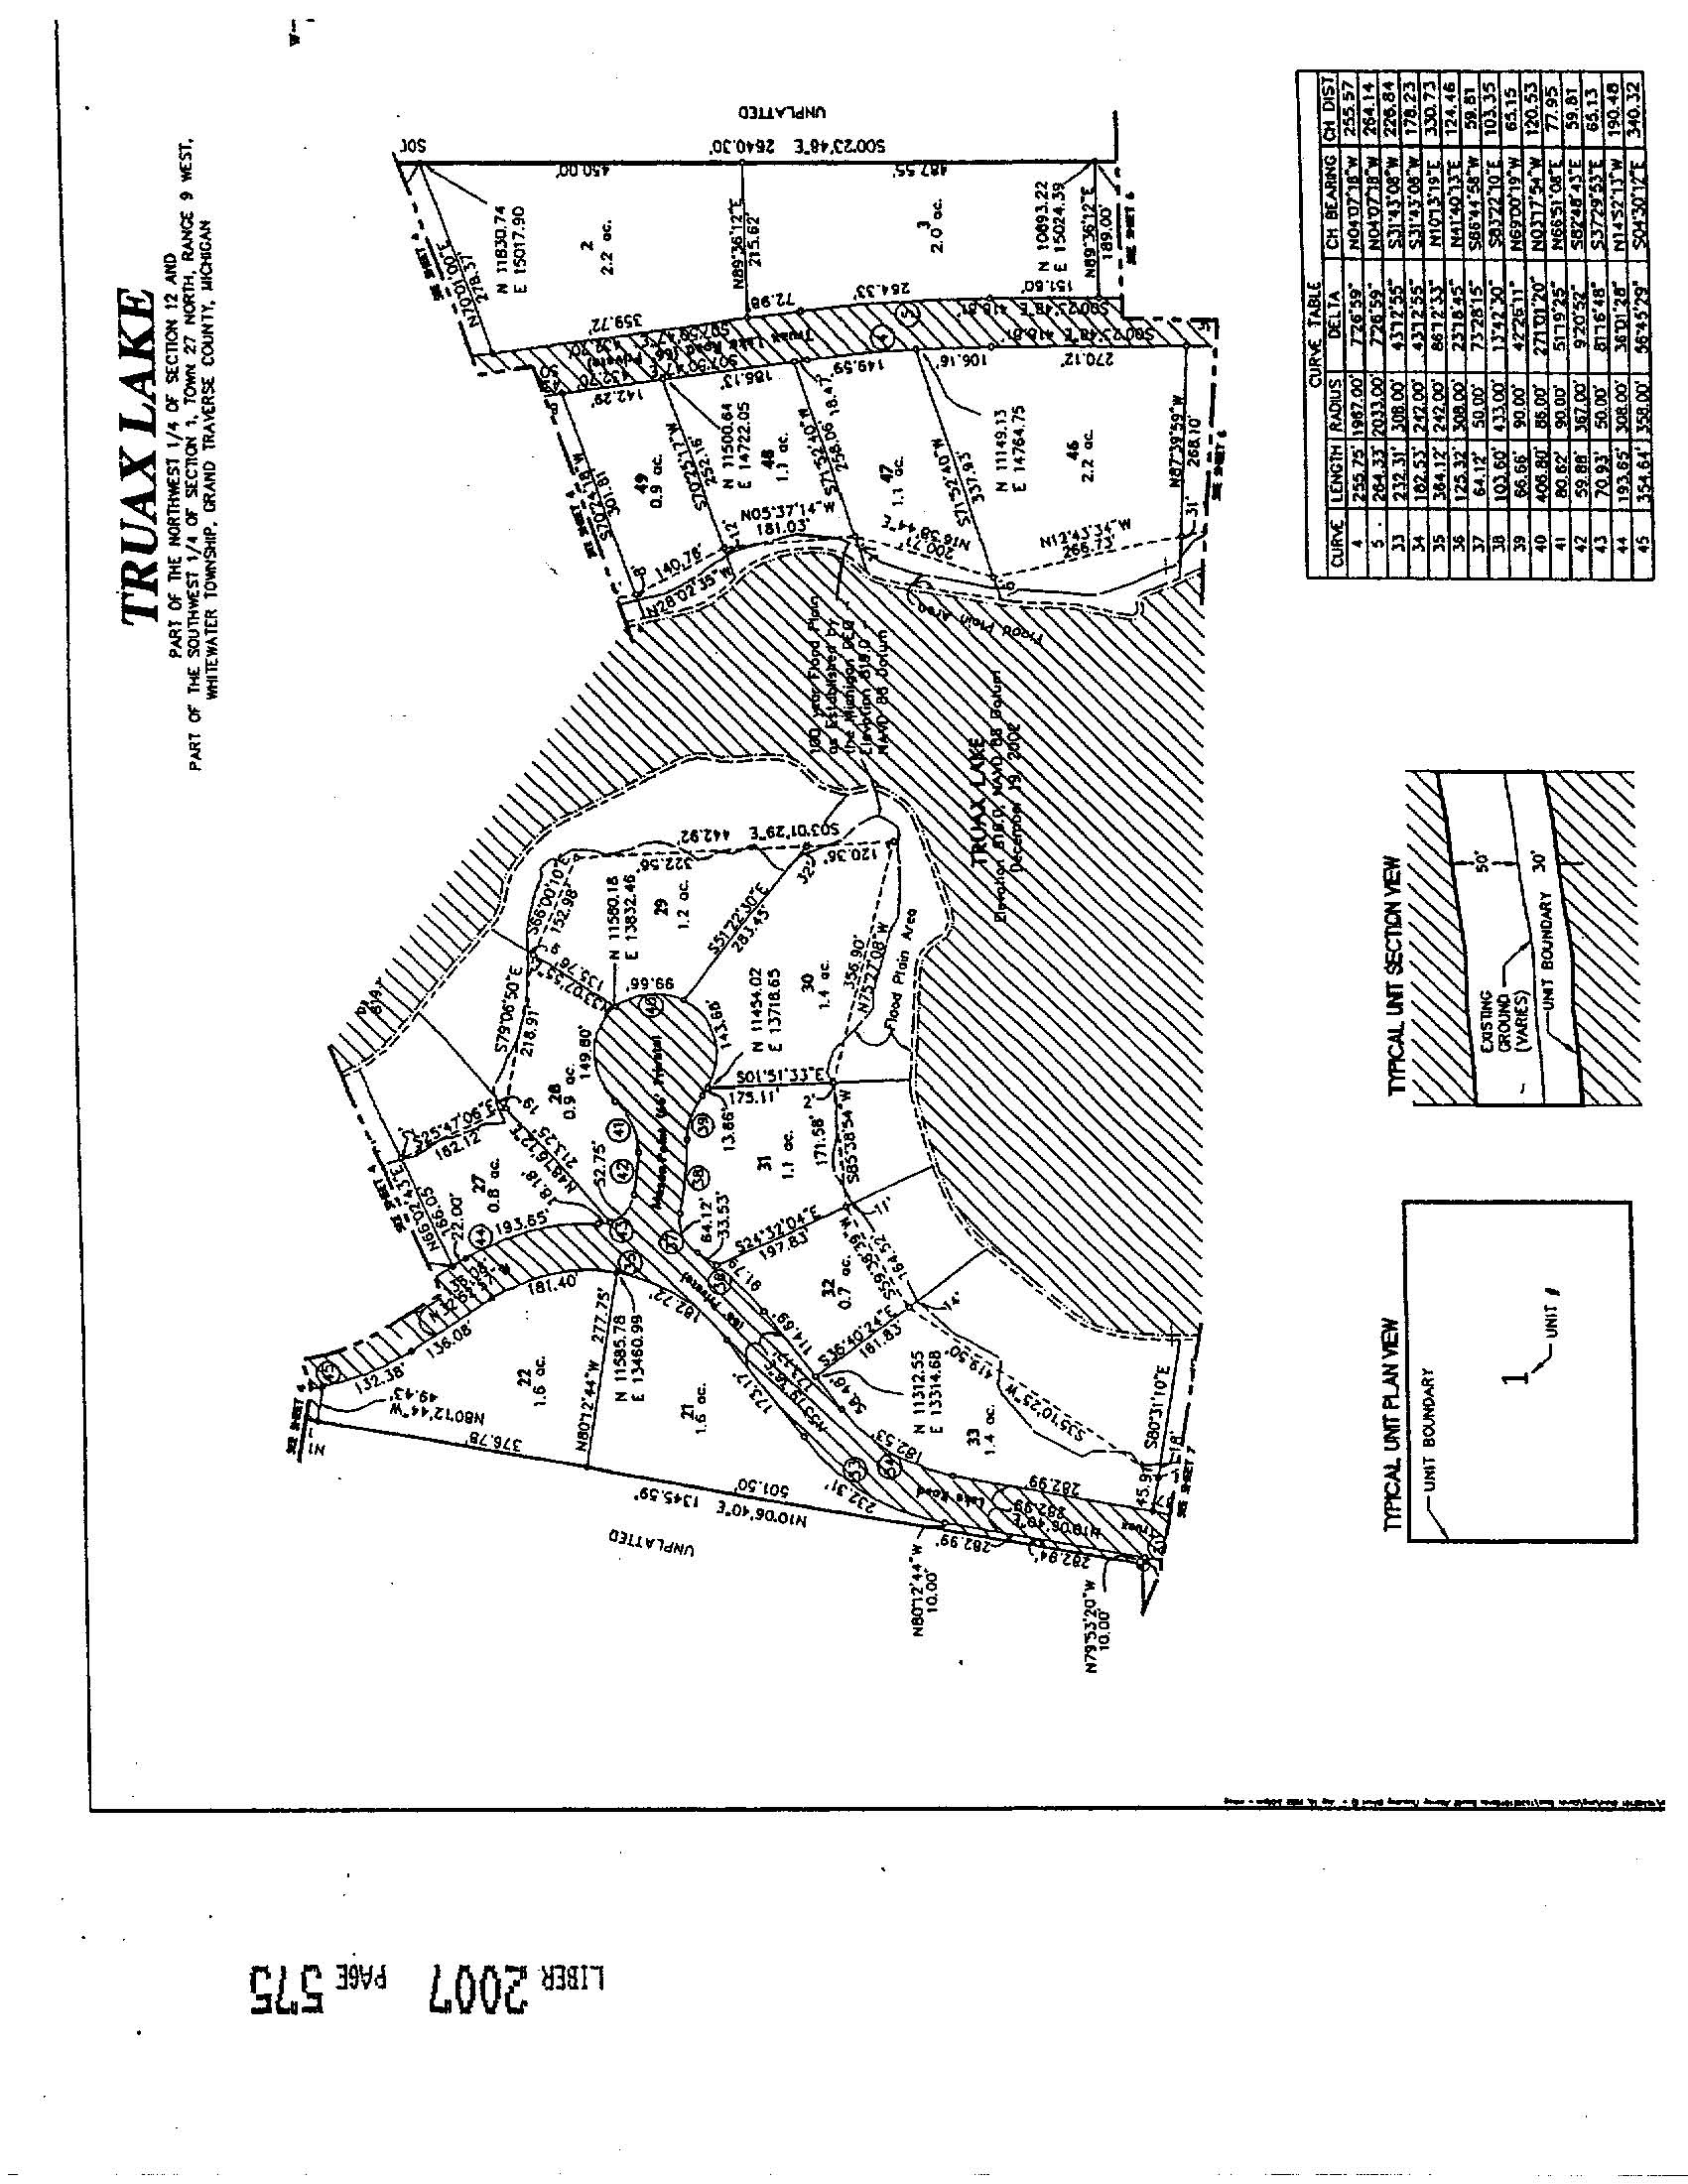 4936 Truax Lake Road, Williamsburg Marketing - For Sale by Oltersdorf Realty LLC (13).jpg